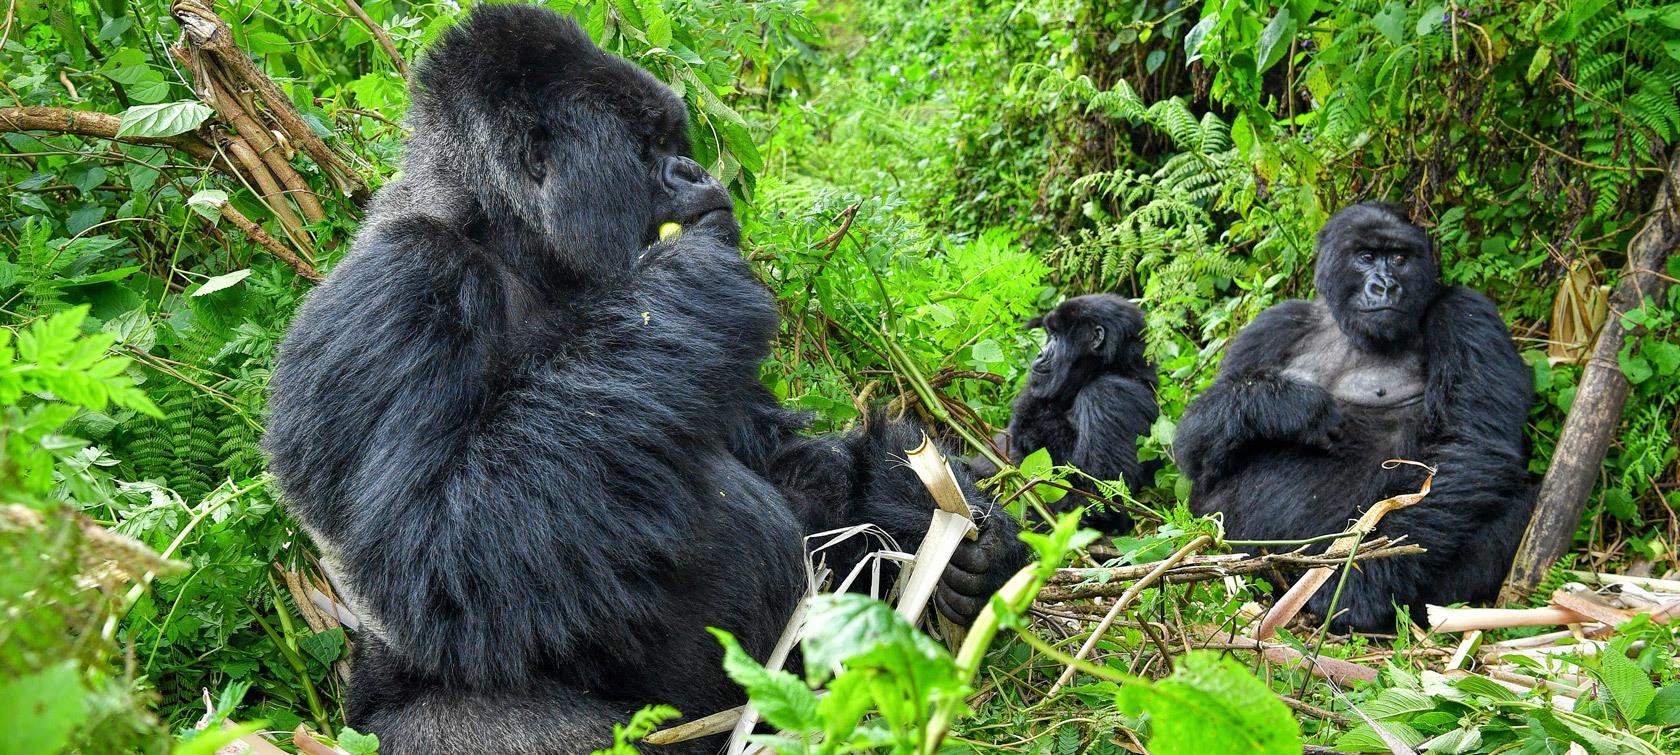 Gorillas of Rwanda, Volcanoes National Park